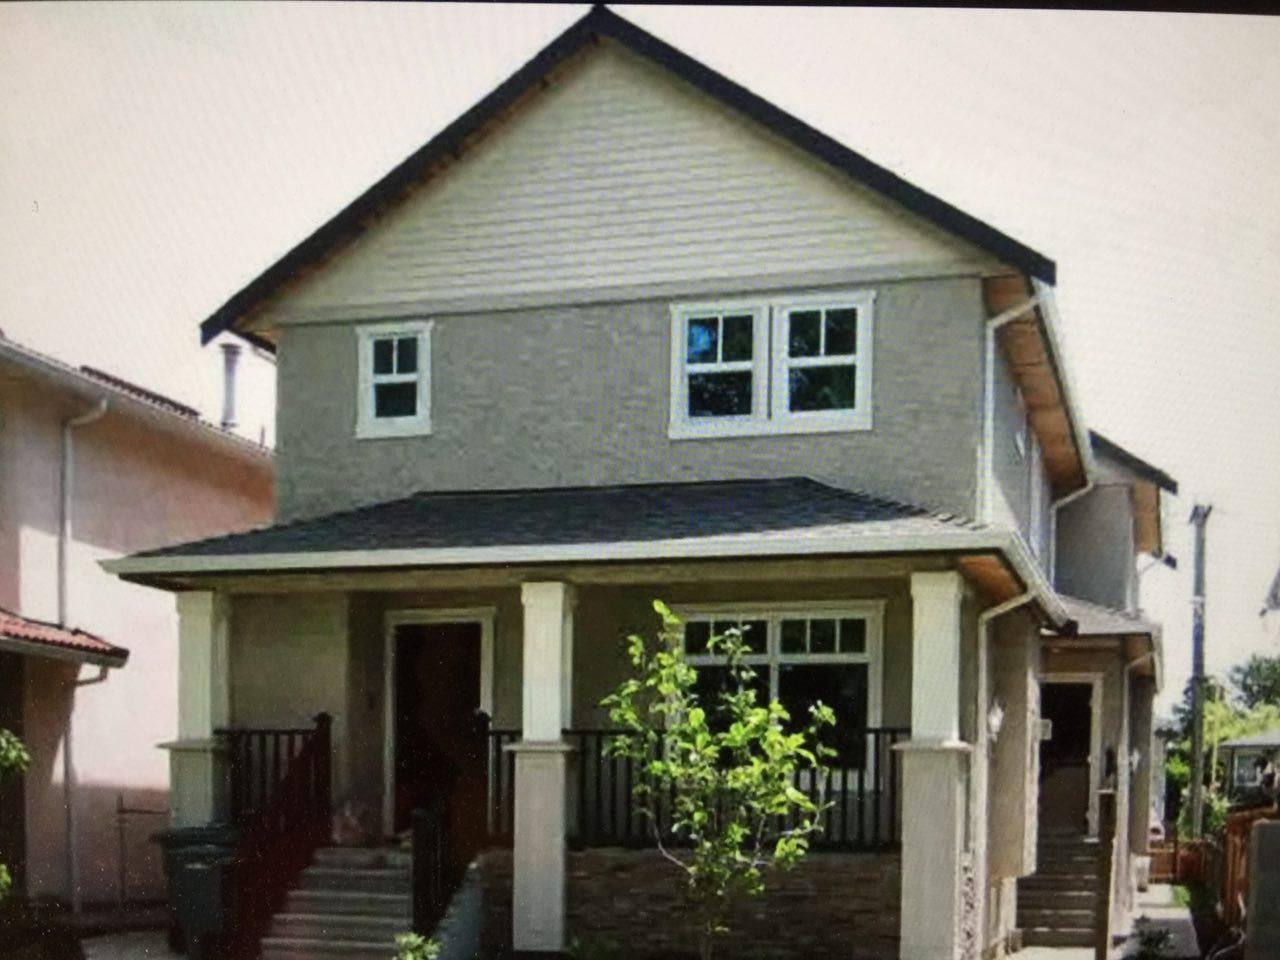 2050 E BROADWAY, Vancouver, BC V5N 1W7